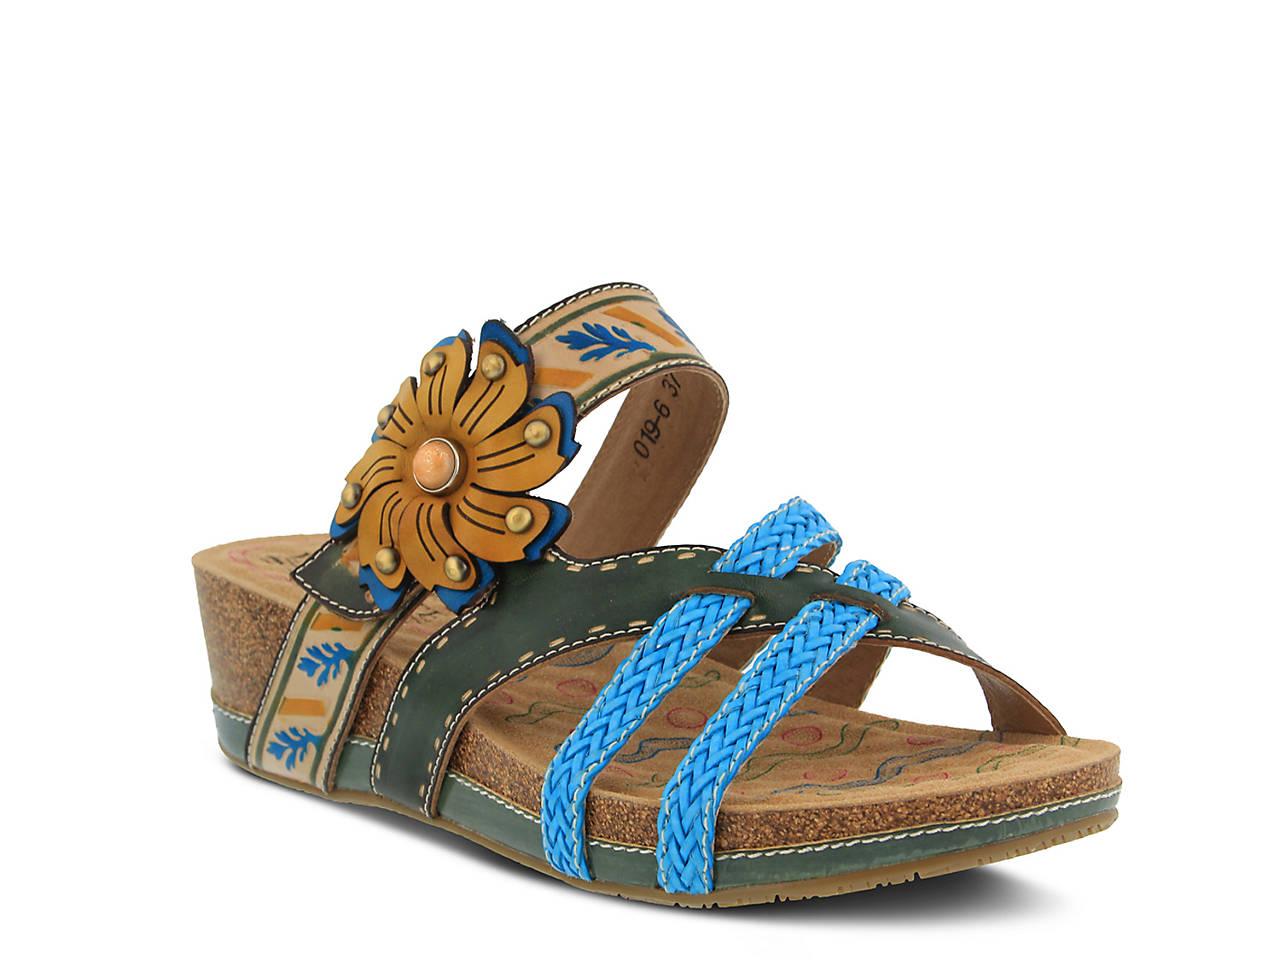 L'Artiste by Spring Step Maribel Flat Sandal (Women's) sYIpSl0